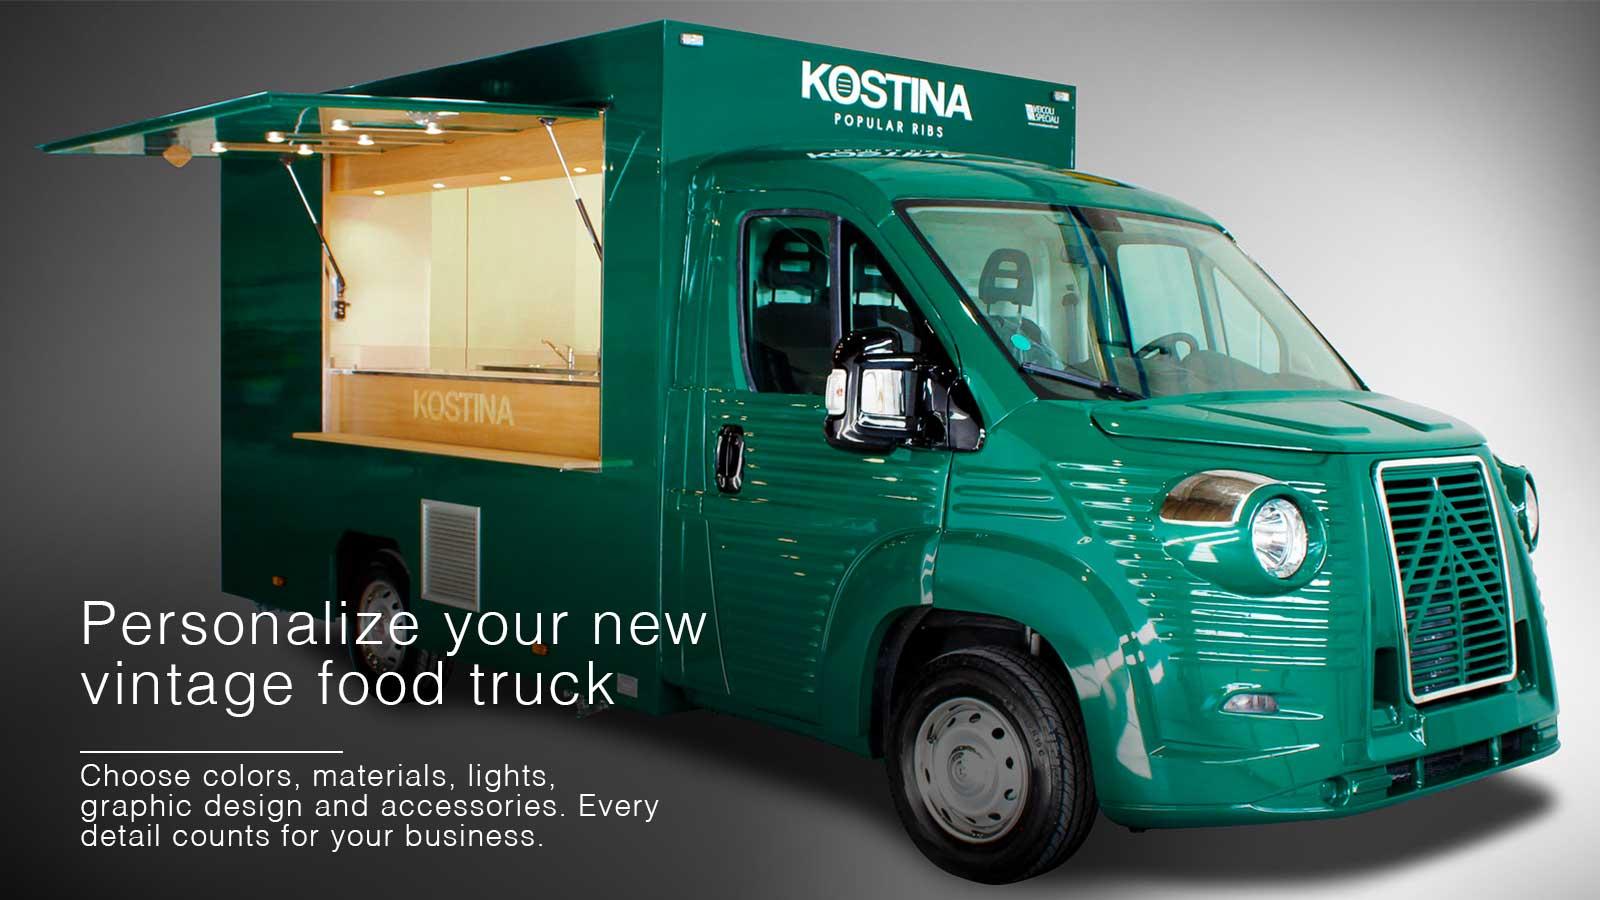 vintage food truck citroen for company promotion